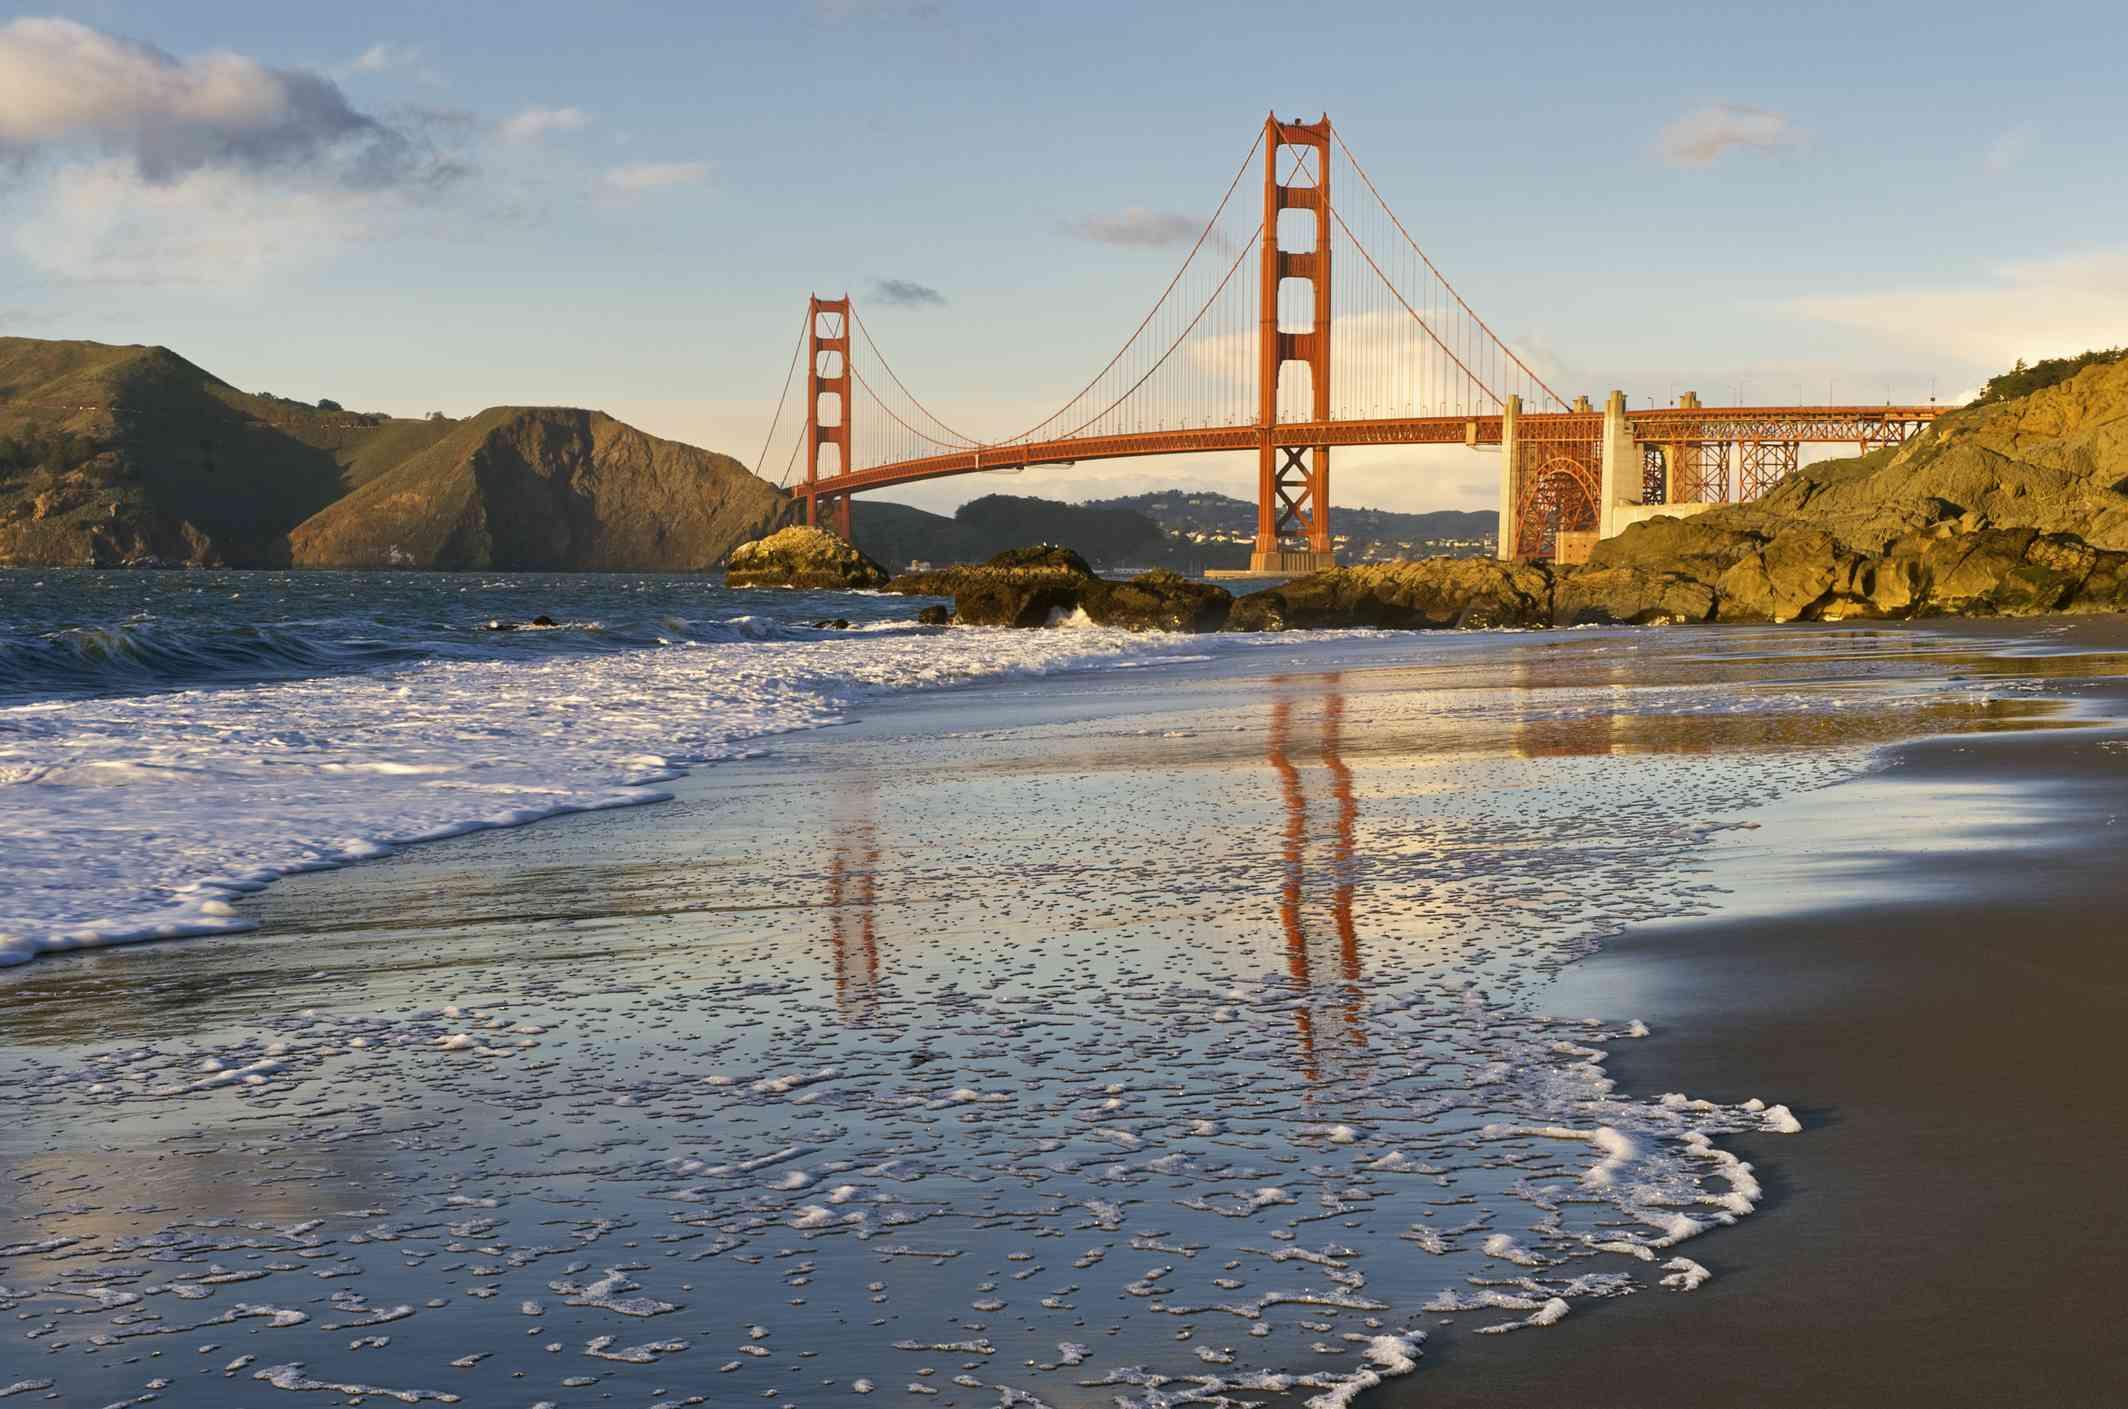 View of the Golden Gate Bridge from Baker Beach